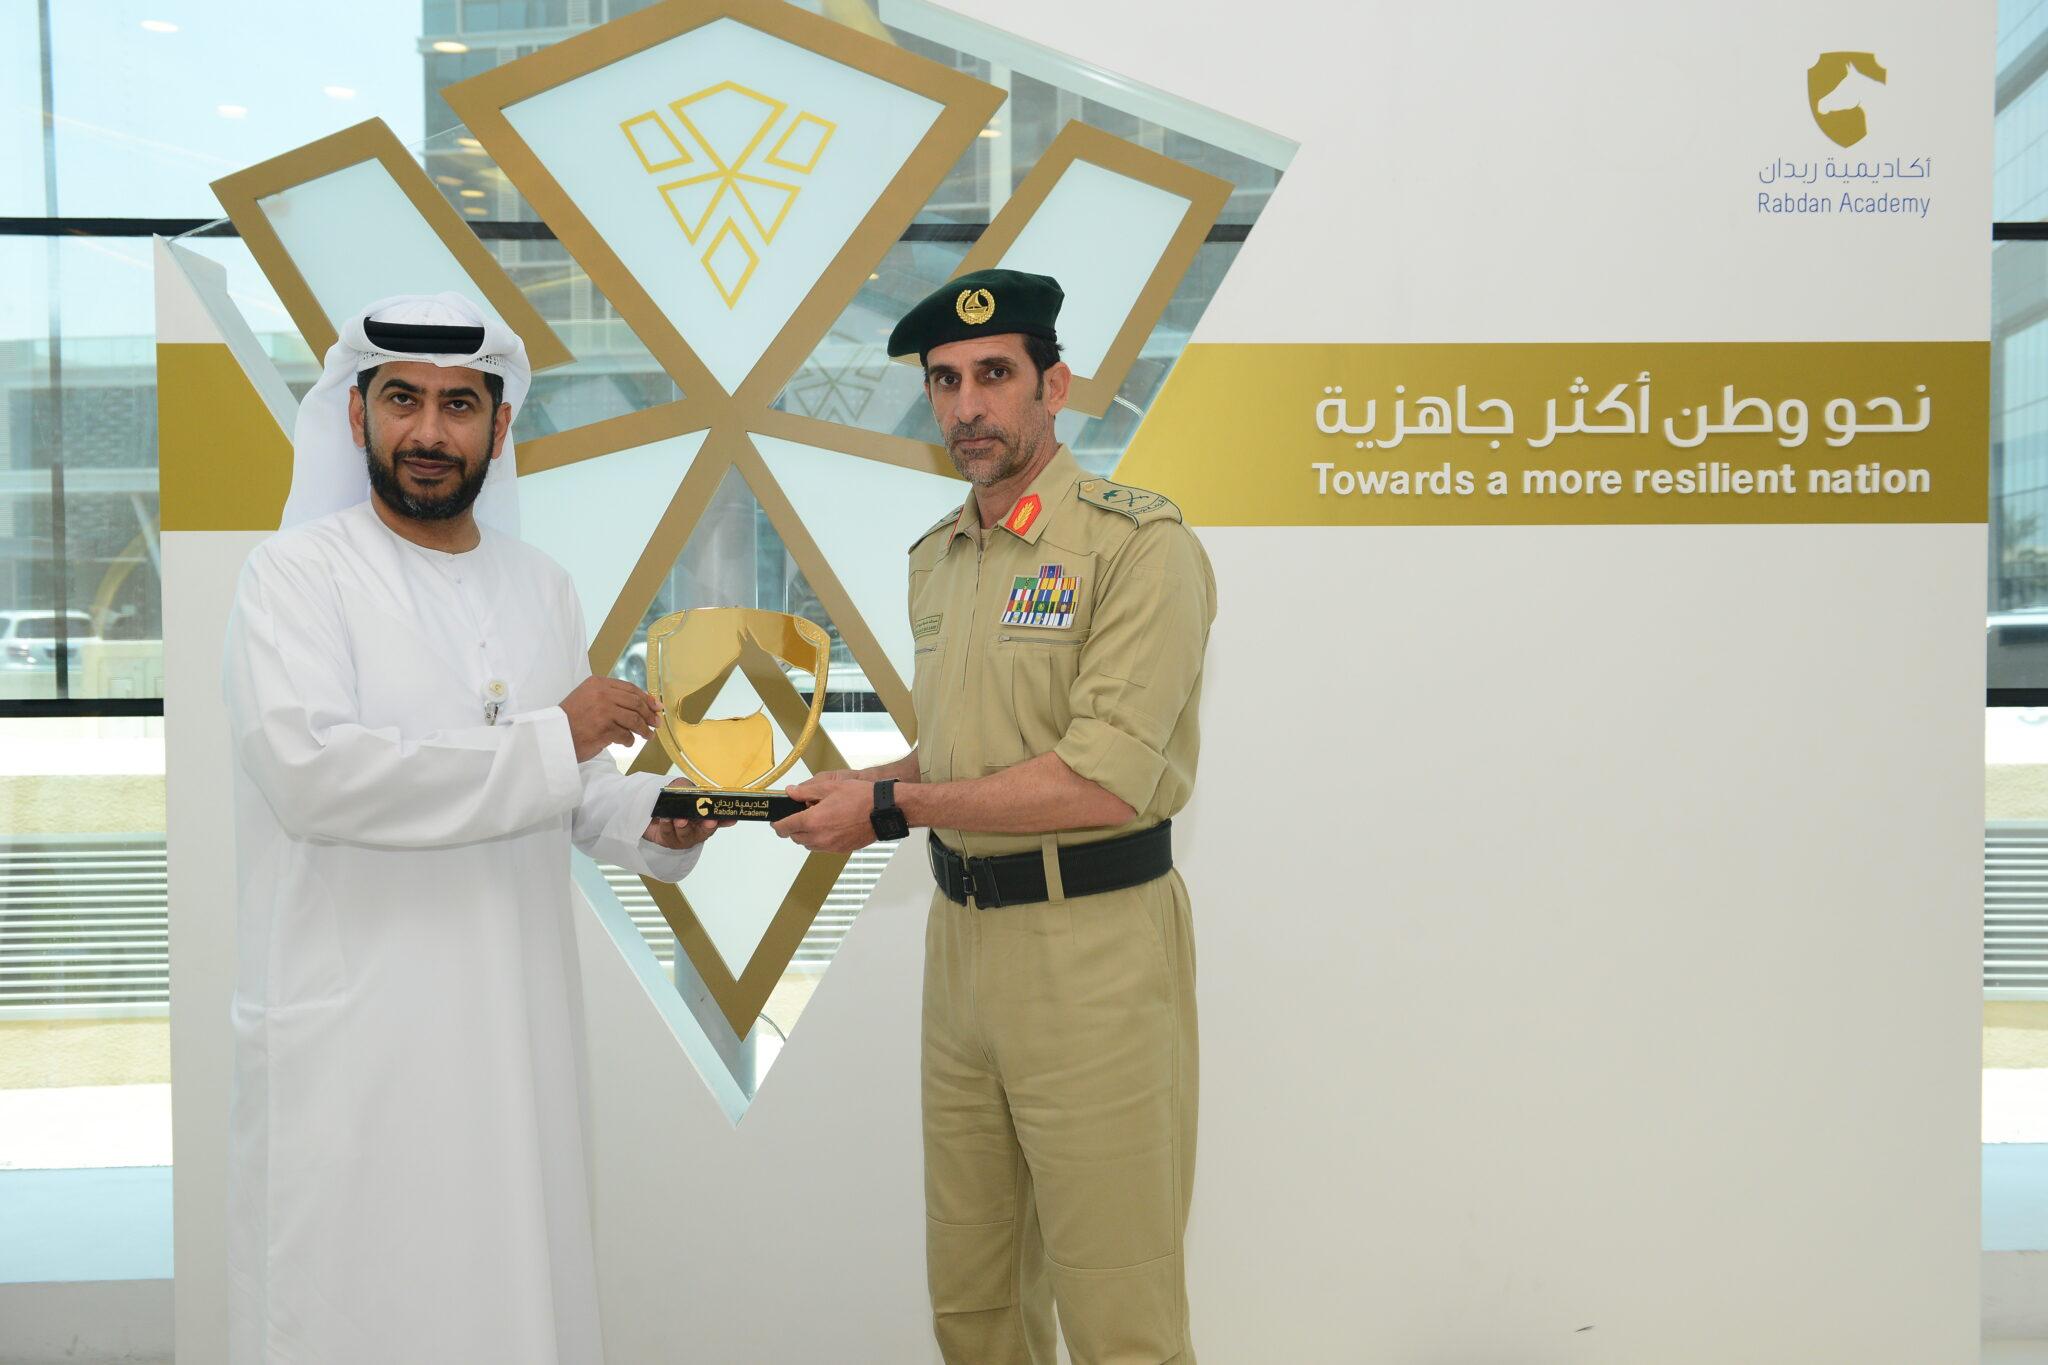 Commander-in-Chief of Dubai Police Visits Rabdan Academy